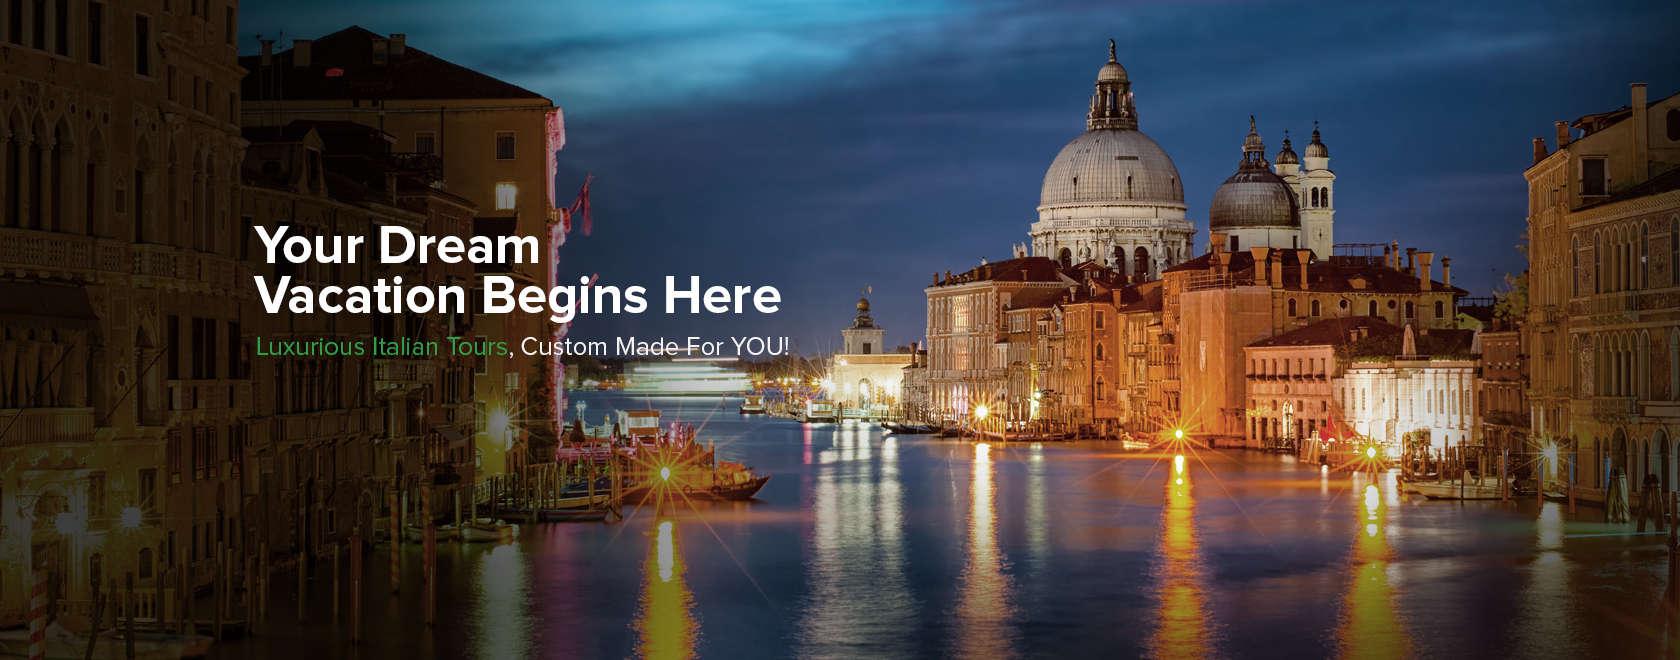 bellarome-customized-italian-vacations